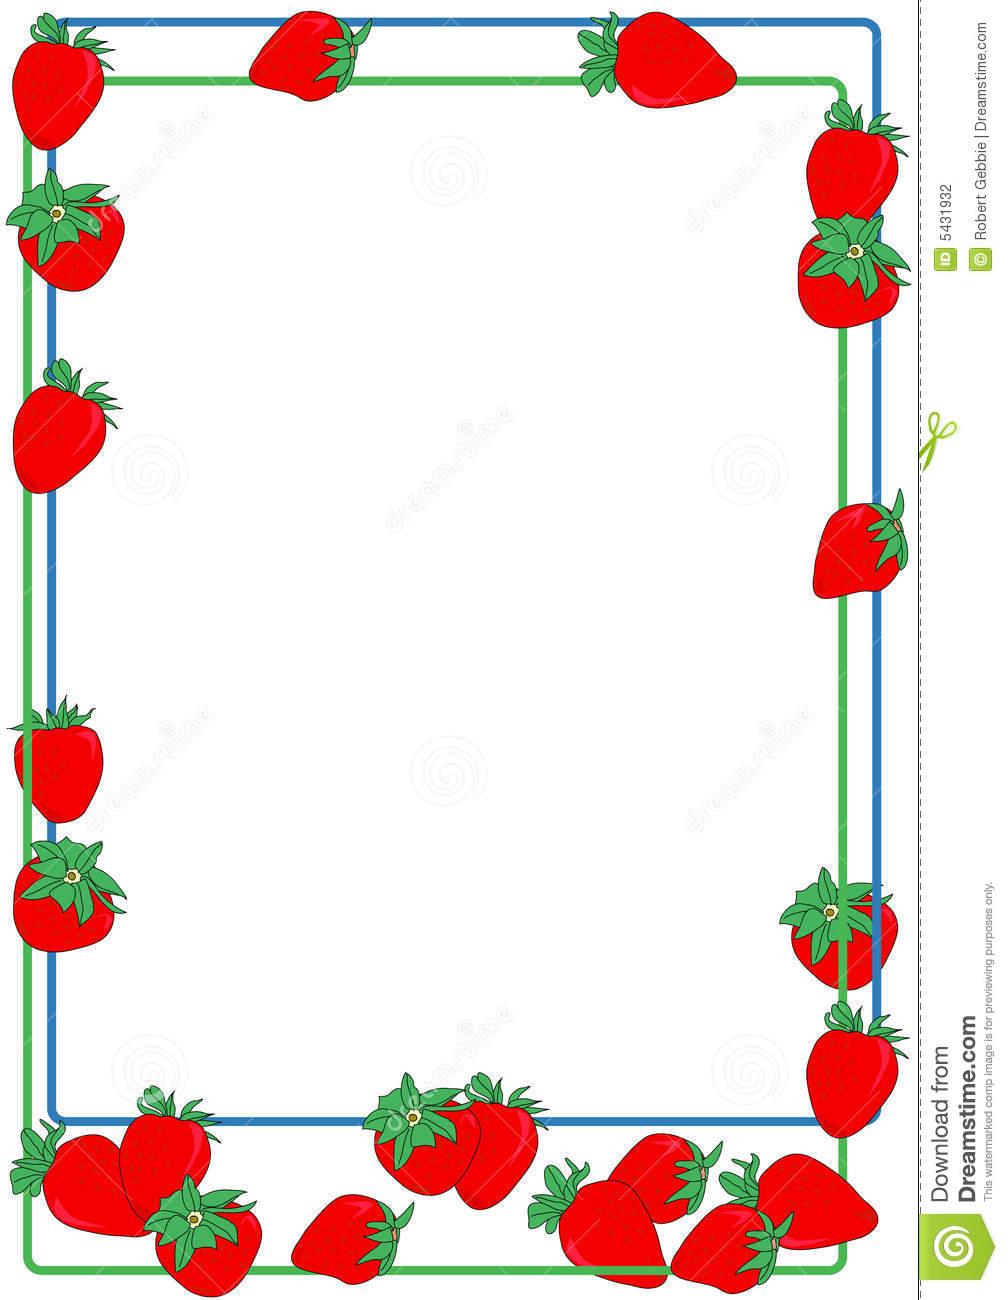 Strawberries clipart borders. Strawberry border panda free